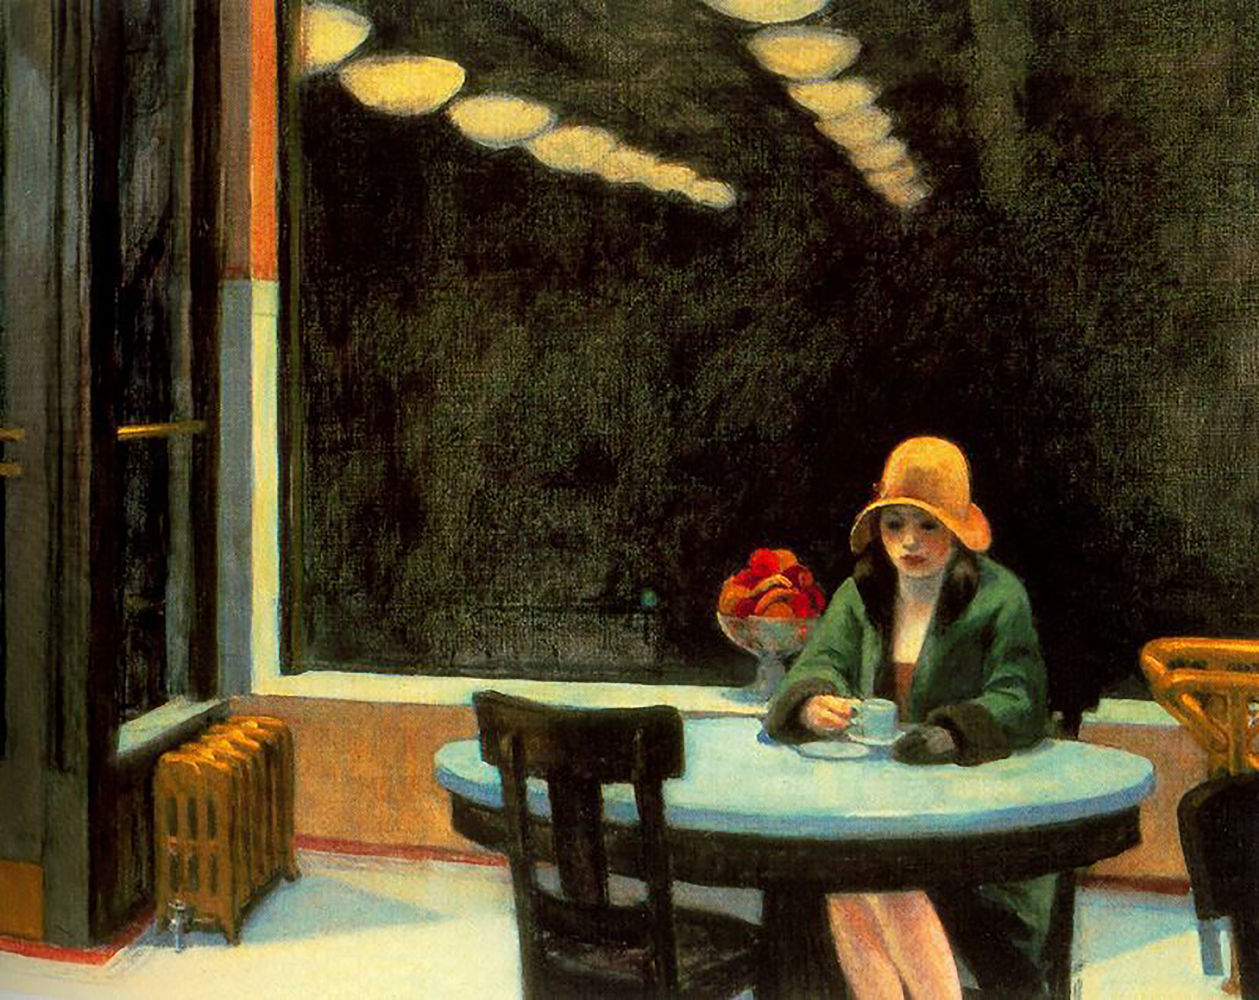 Automat (1927), Κέντρο Τέχνης του Ντε Μόινς